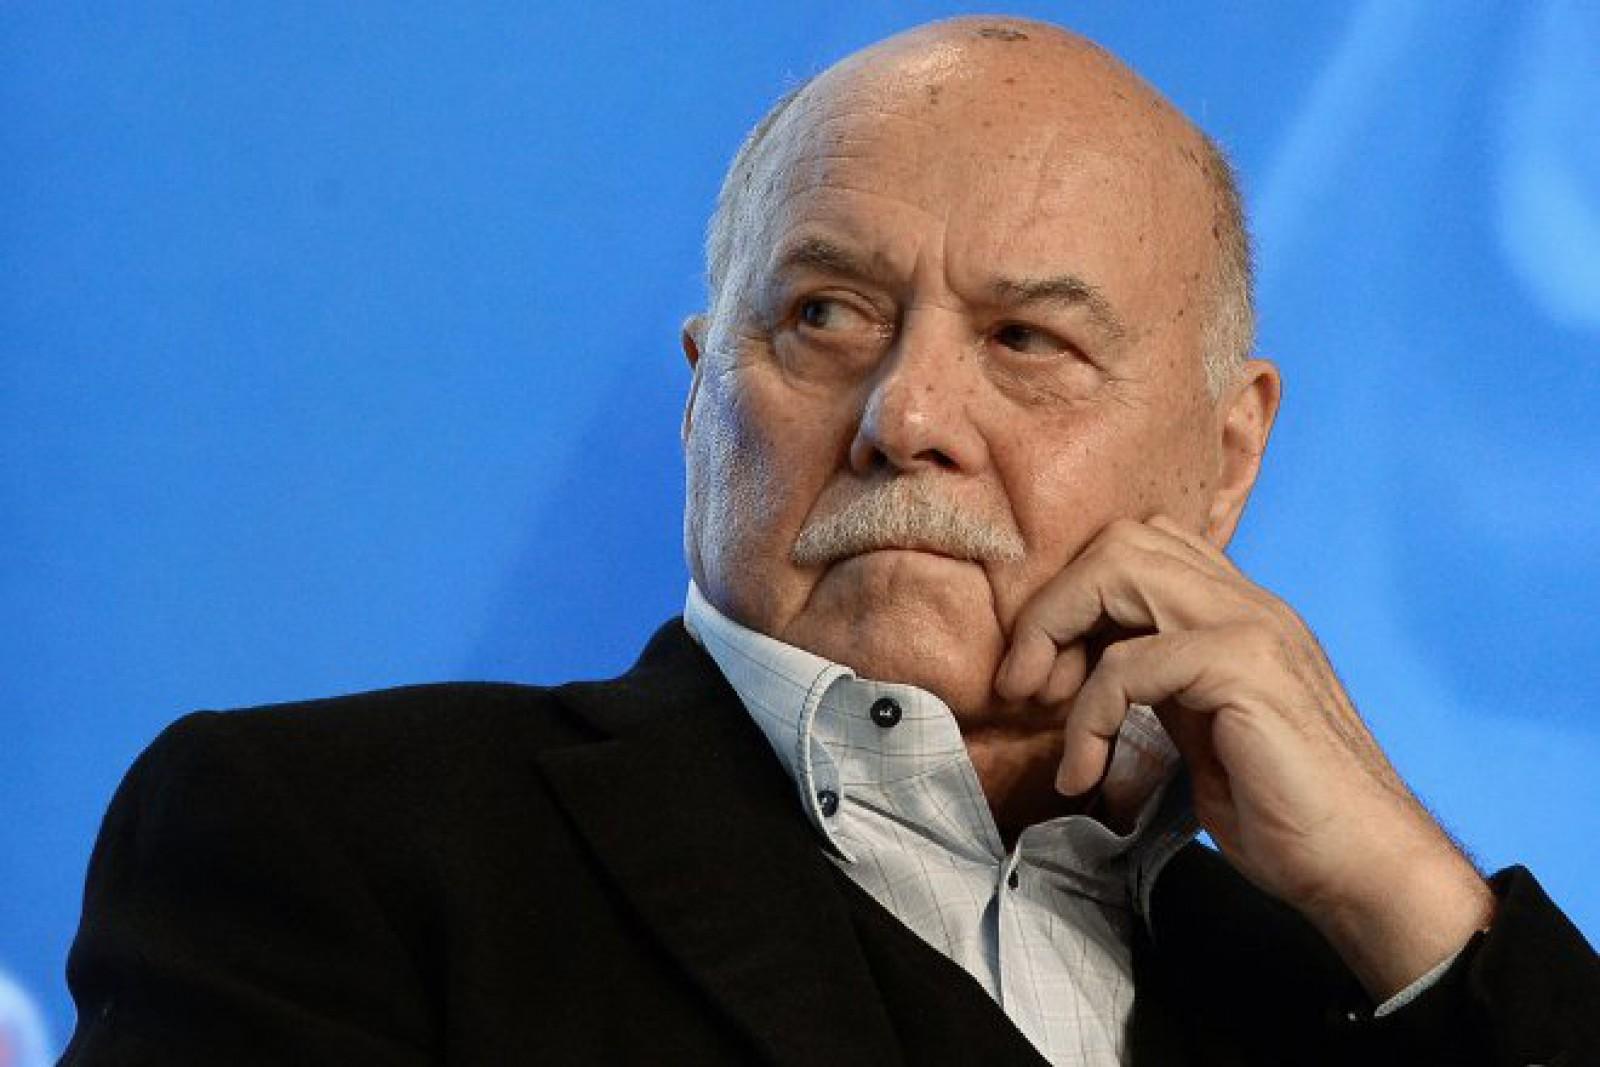 A murit regizorul rus Stanislav Govoruhin, la vârsta de 82 de ani